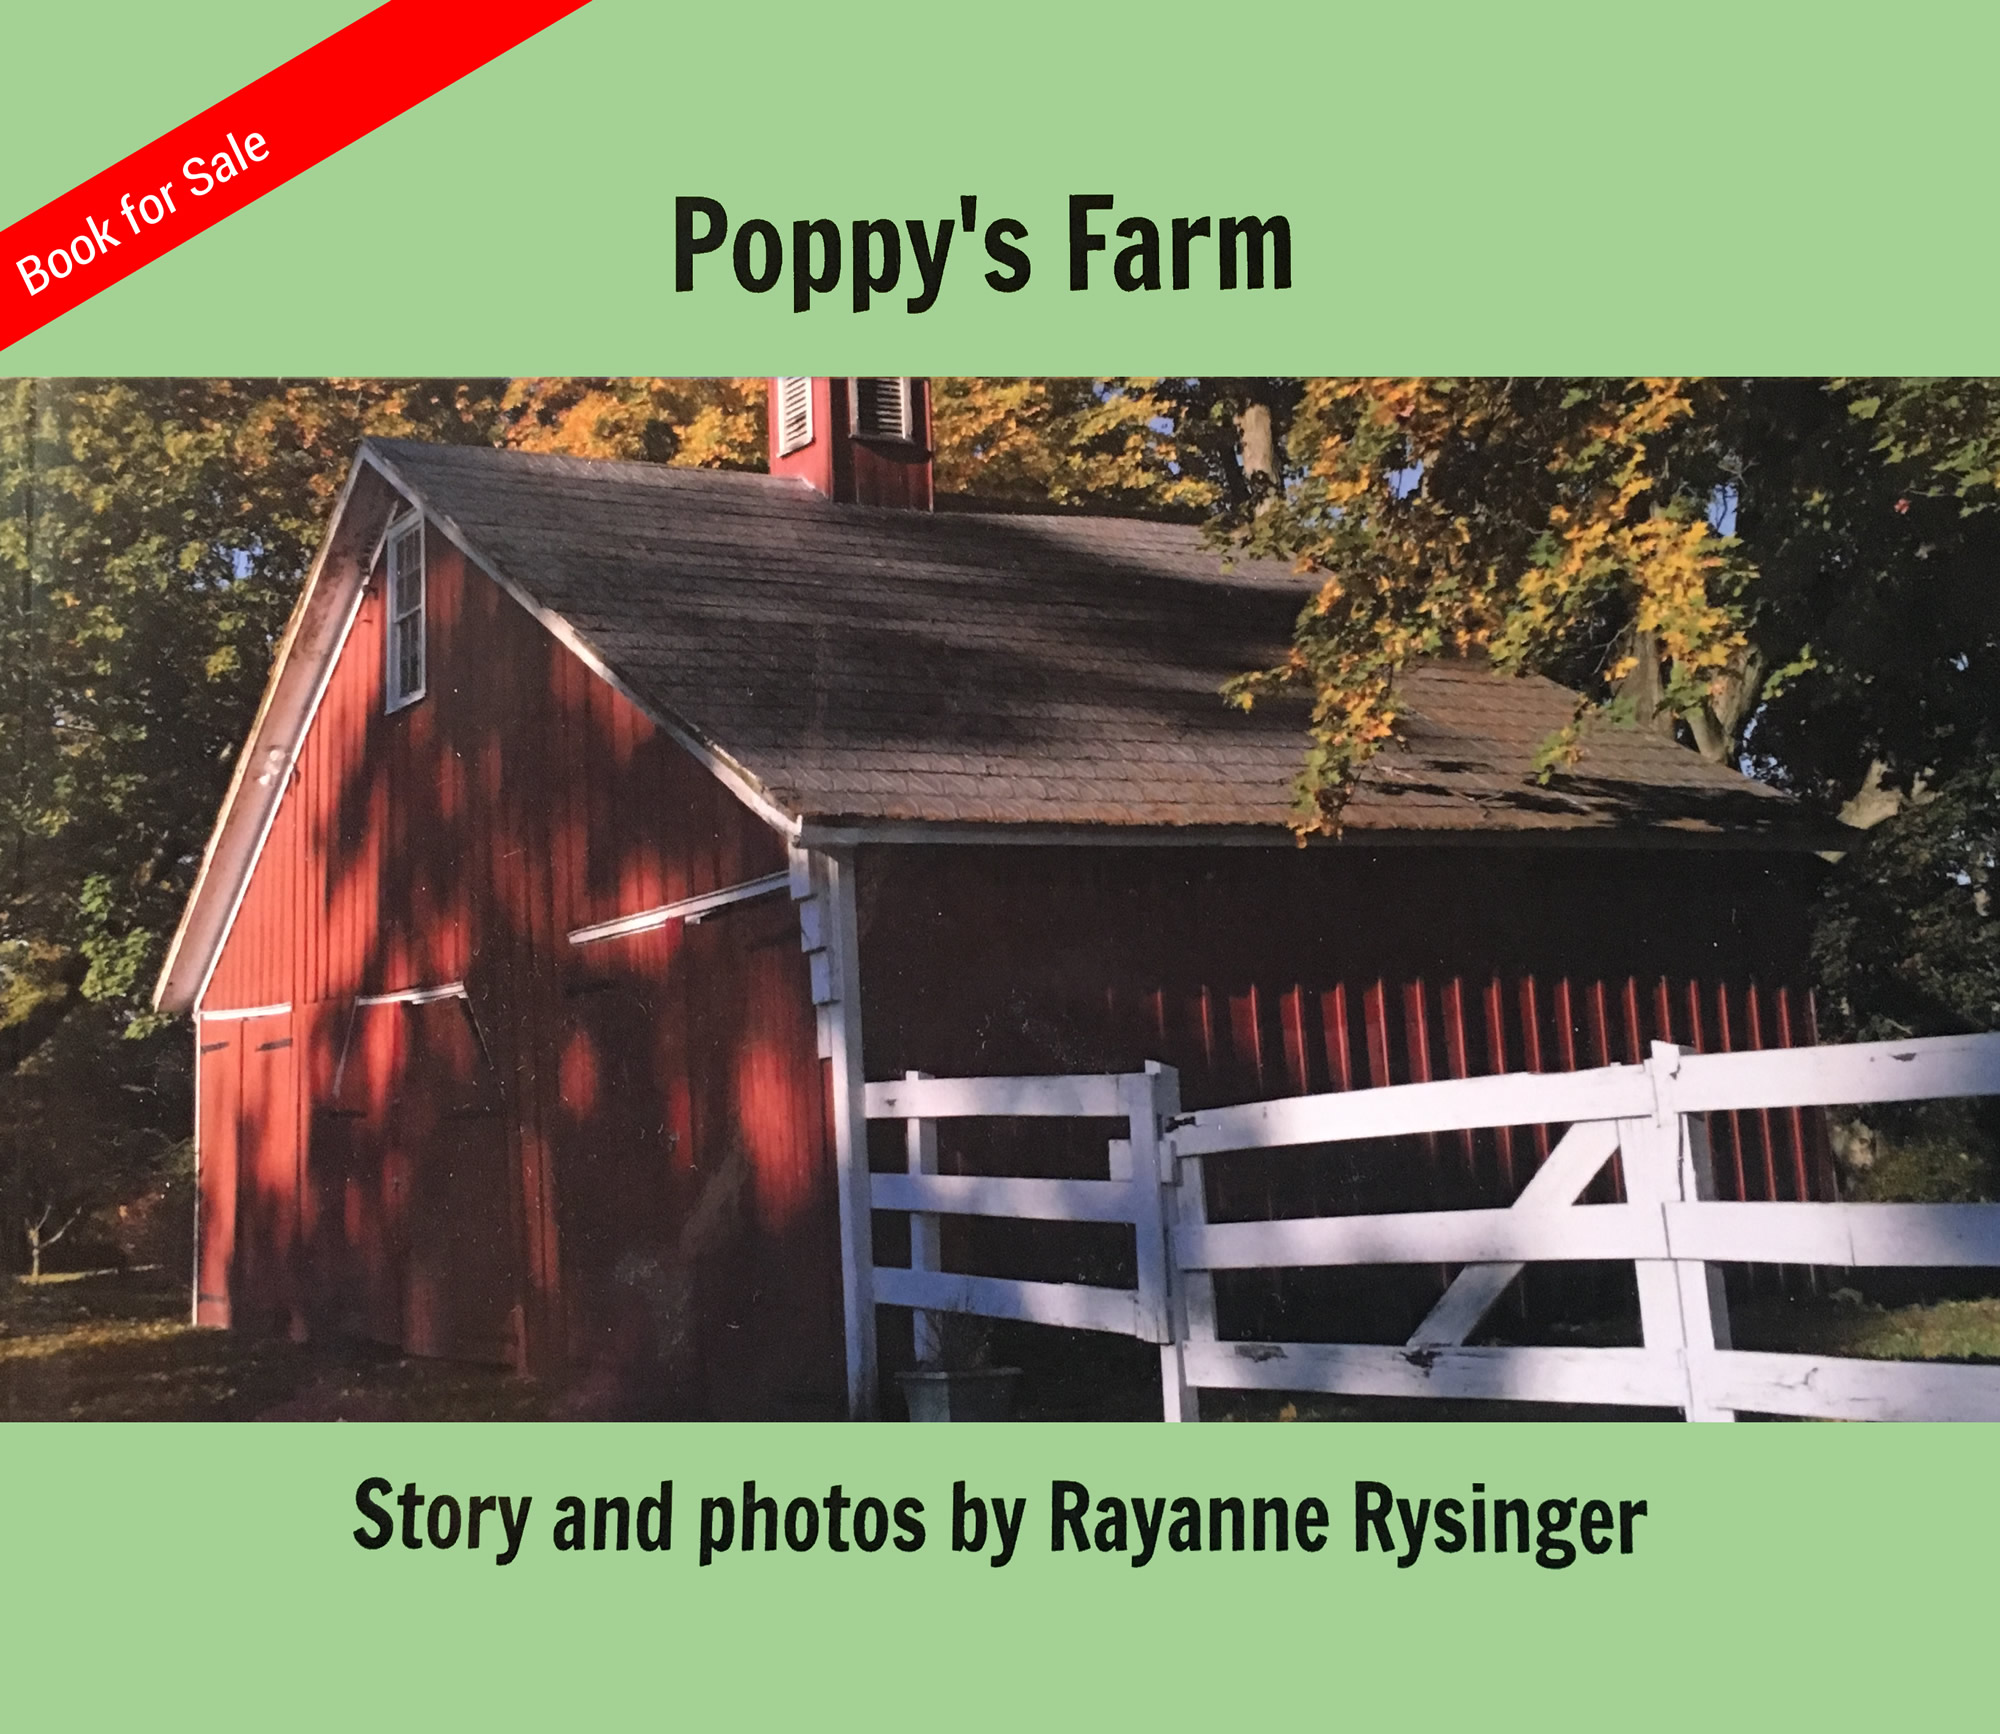 Poppy's Farm